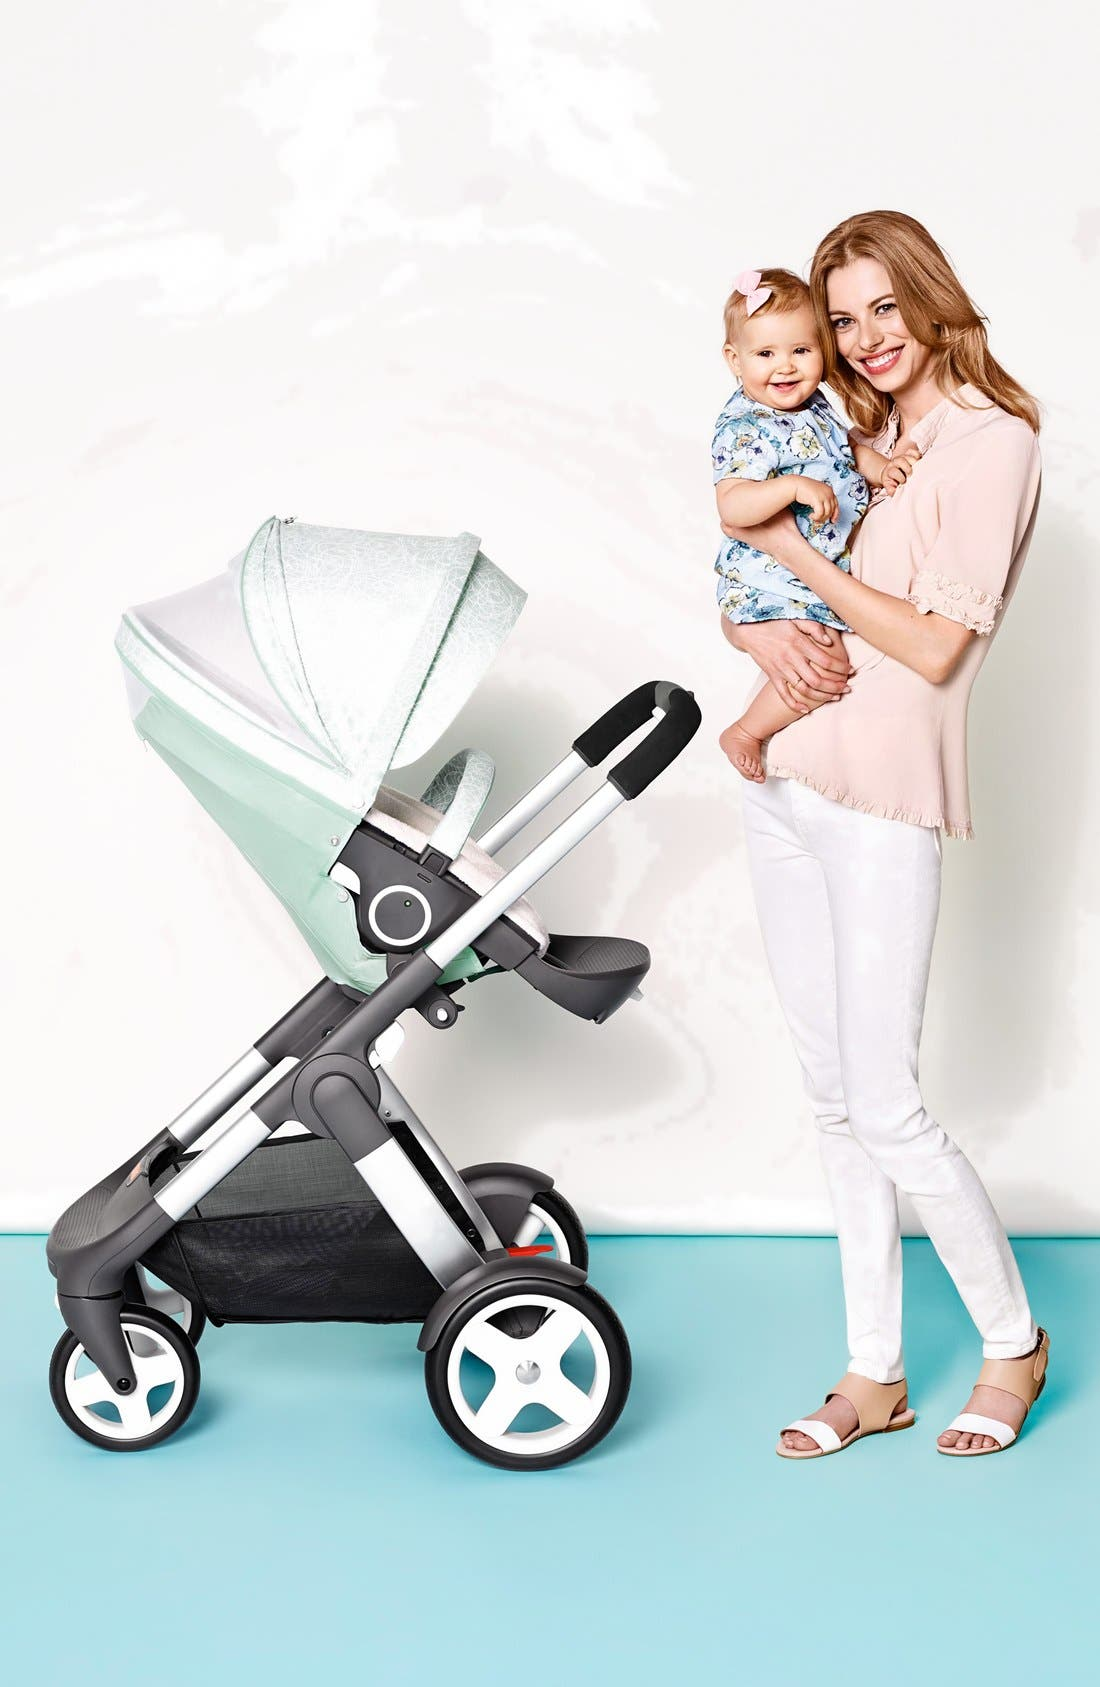 Baby 'Xplory<sup>®</sup> Stroller Summer Kit' Shade Set,                             Alternate thumbnail 7, color,                             Salty Blue